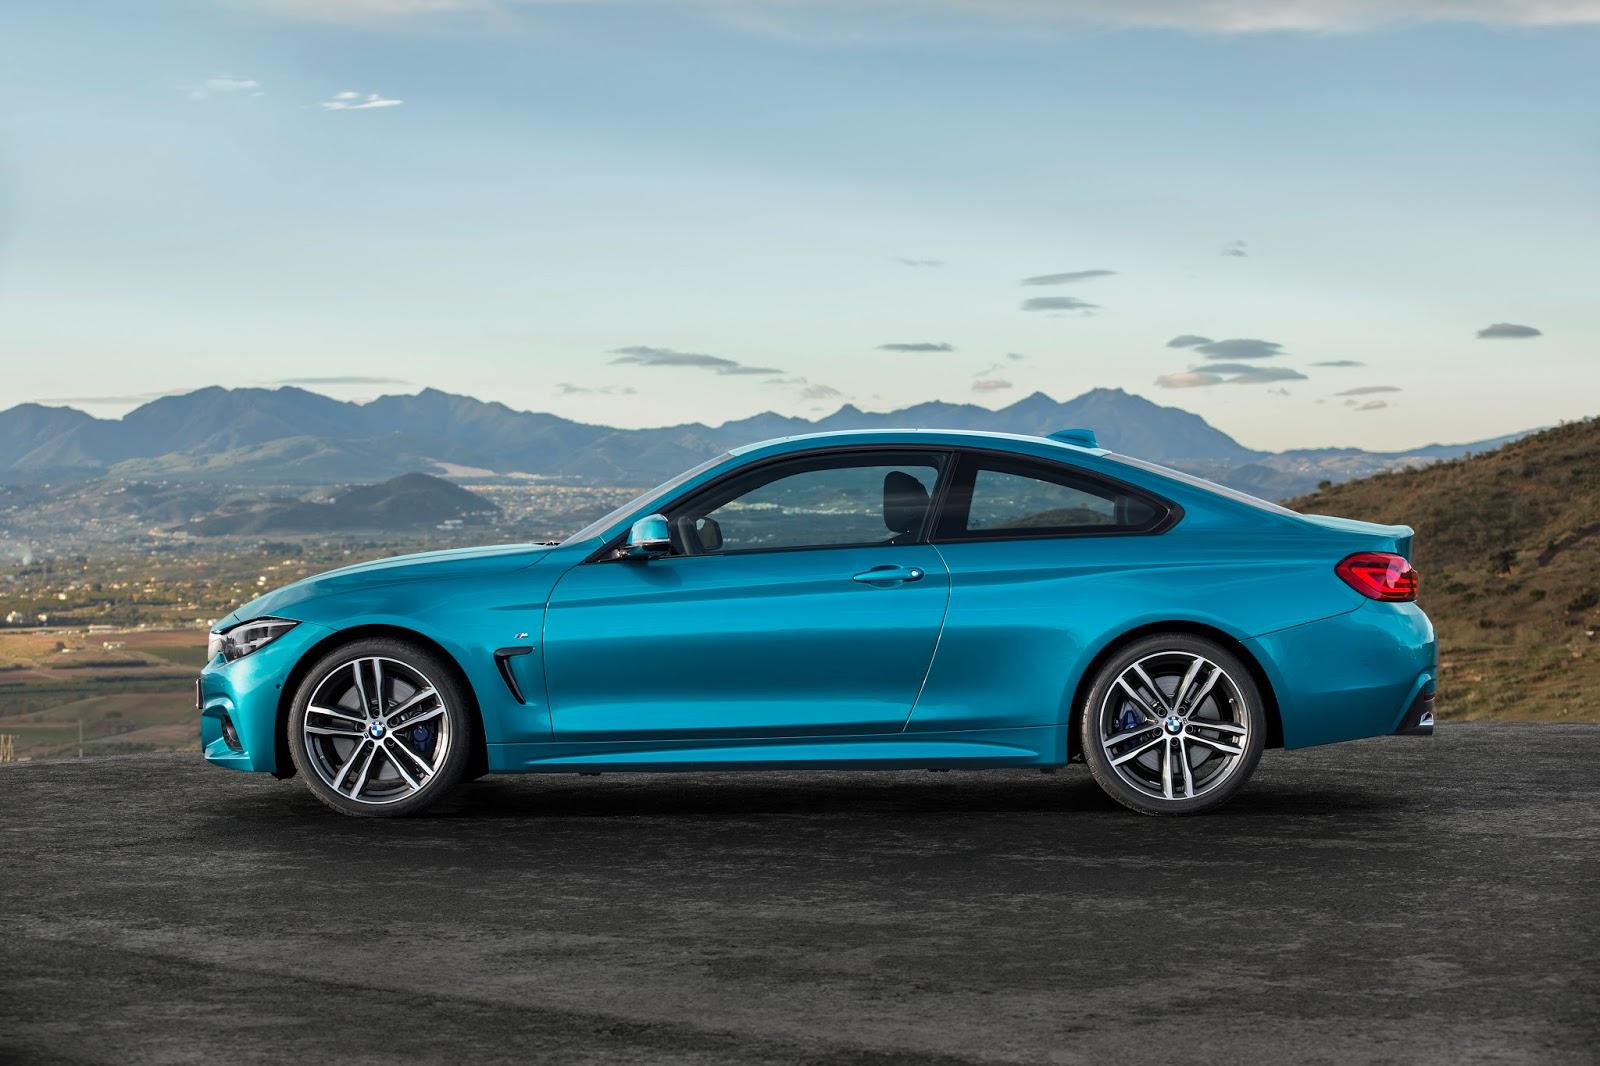 P90245205 highRes bmw 4 series m sport Η νέα BMW Σειρά 4, με πιο σφιχτή ρύθμιση ανάρτησης BMW, Bmw 4, BMW 4 Cabrio, BMW 4 Coupe, BMW 4 Gran Coupé, Facelift